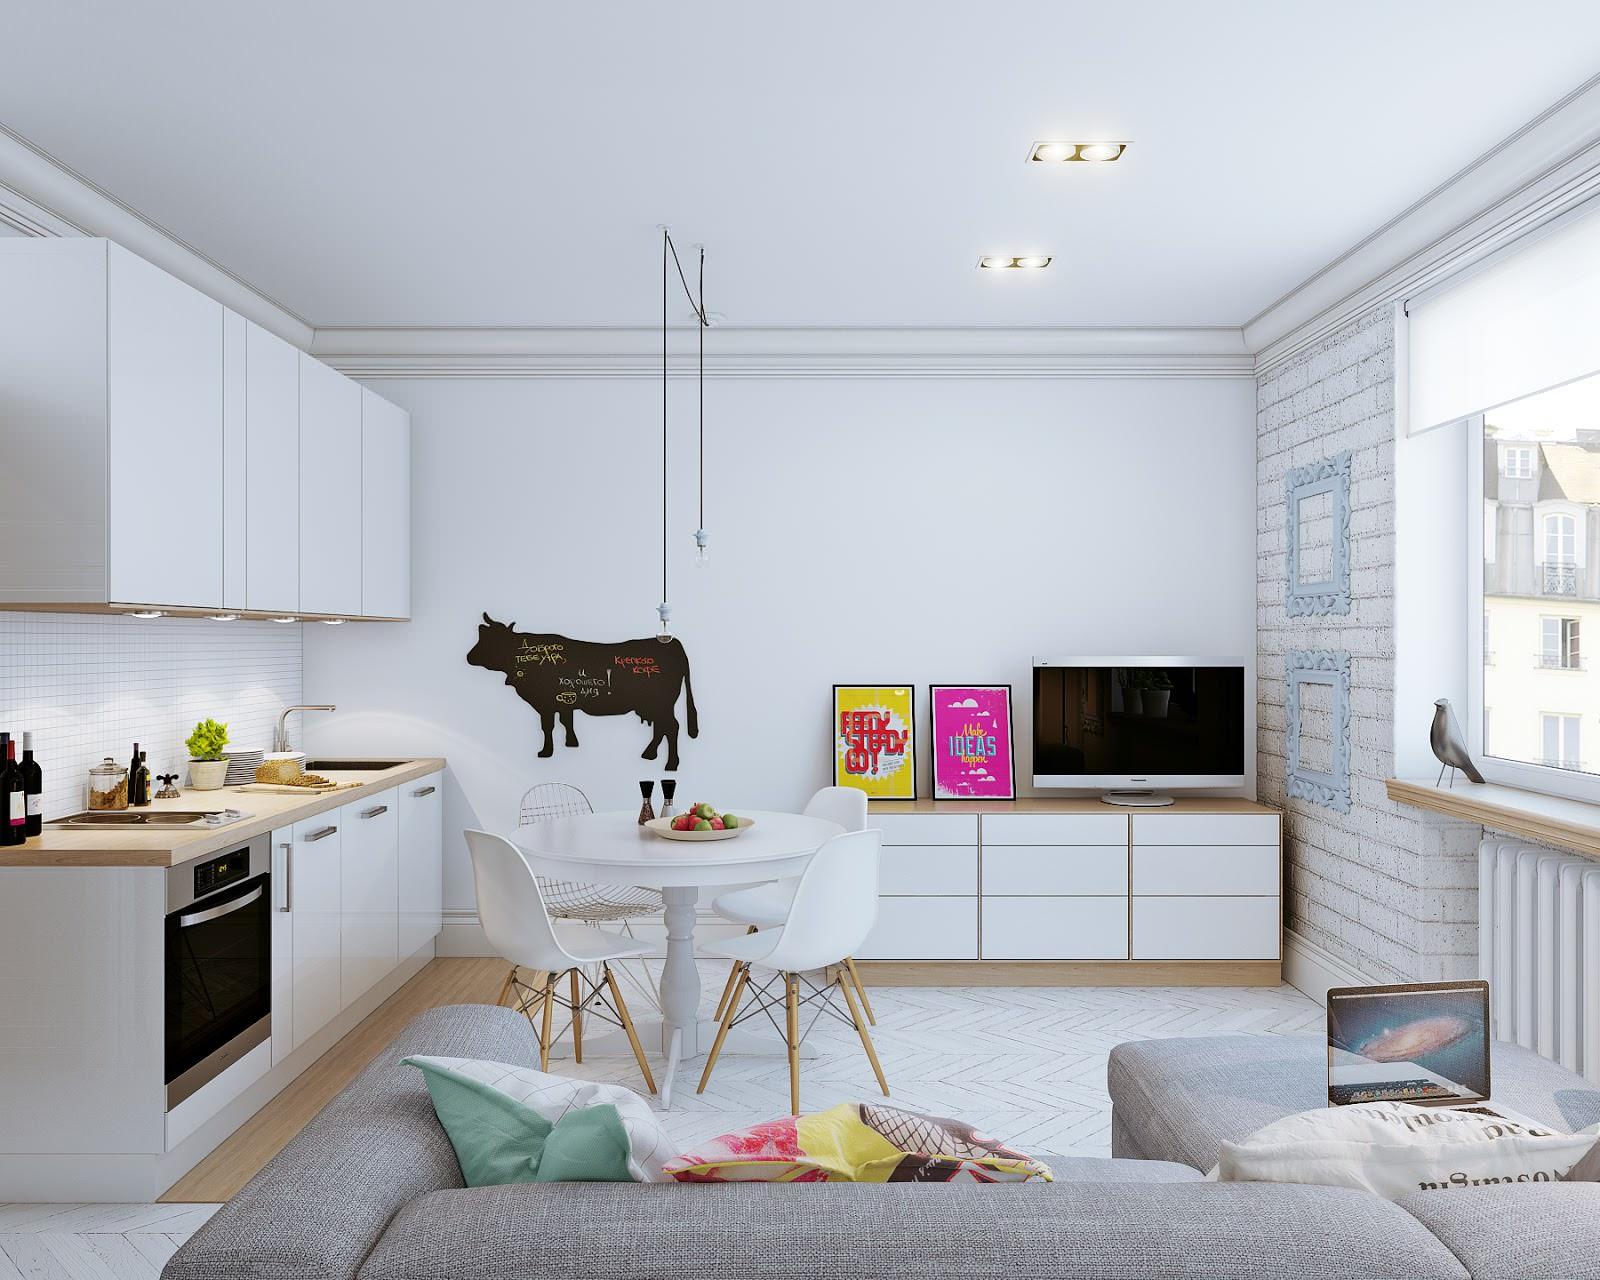 skandinavskij-dizajn-interera-malenkoj-kvartiry-studii-24-kv-m10